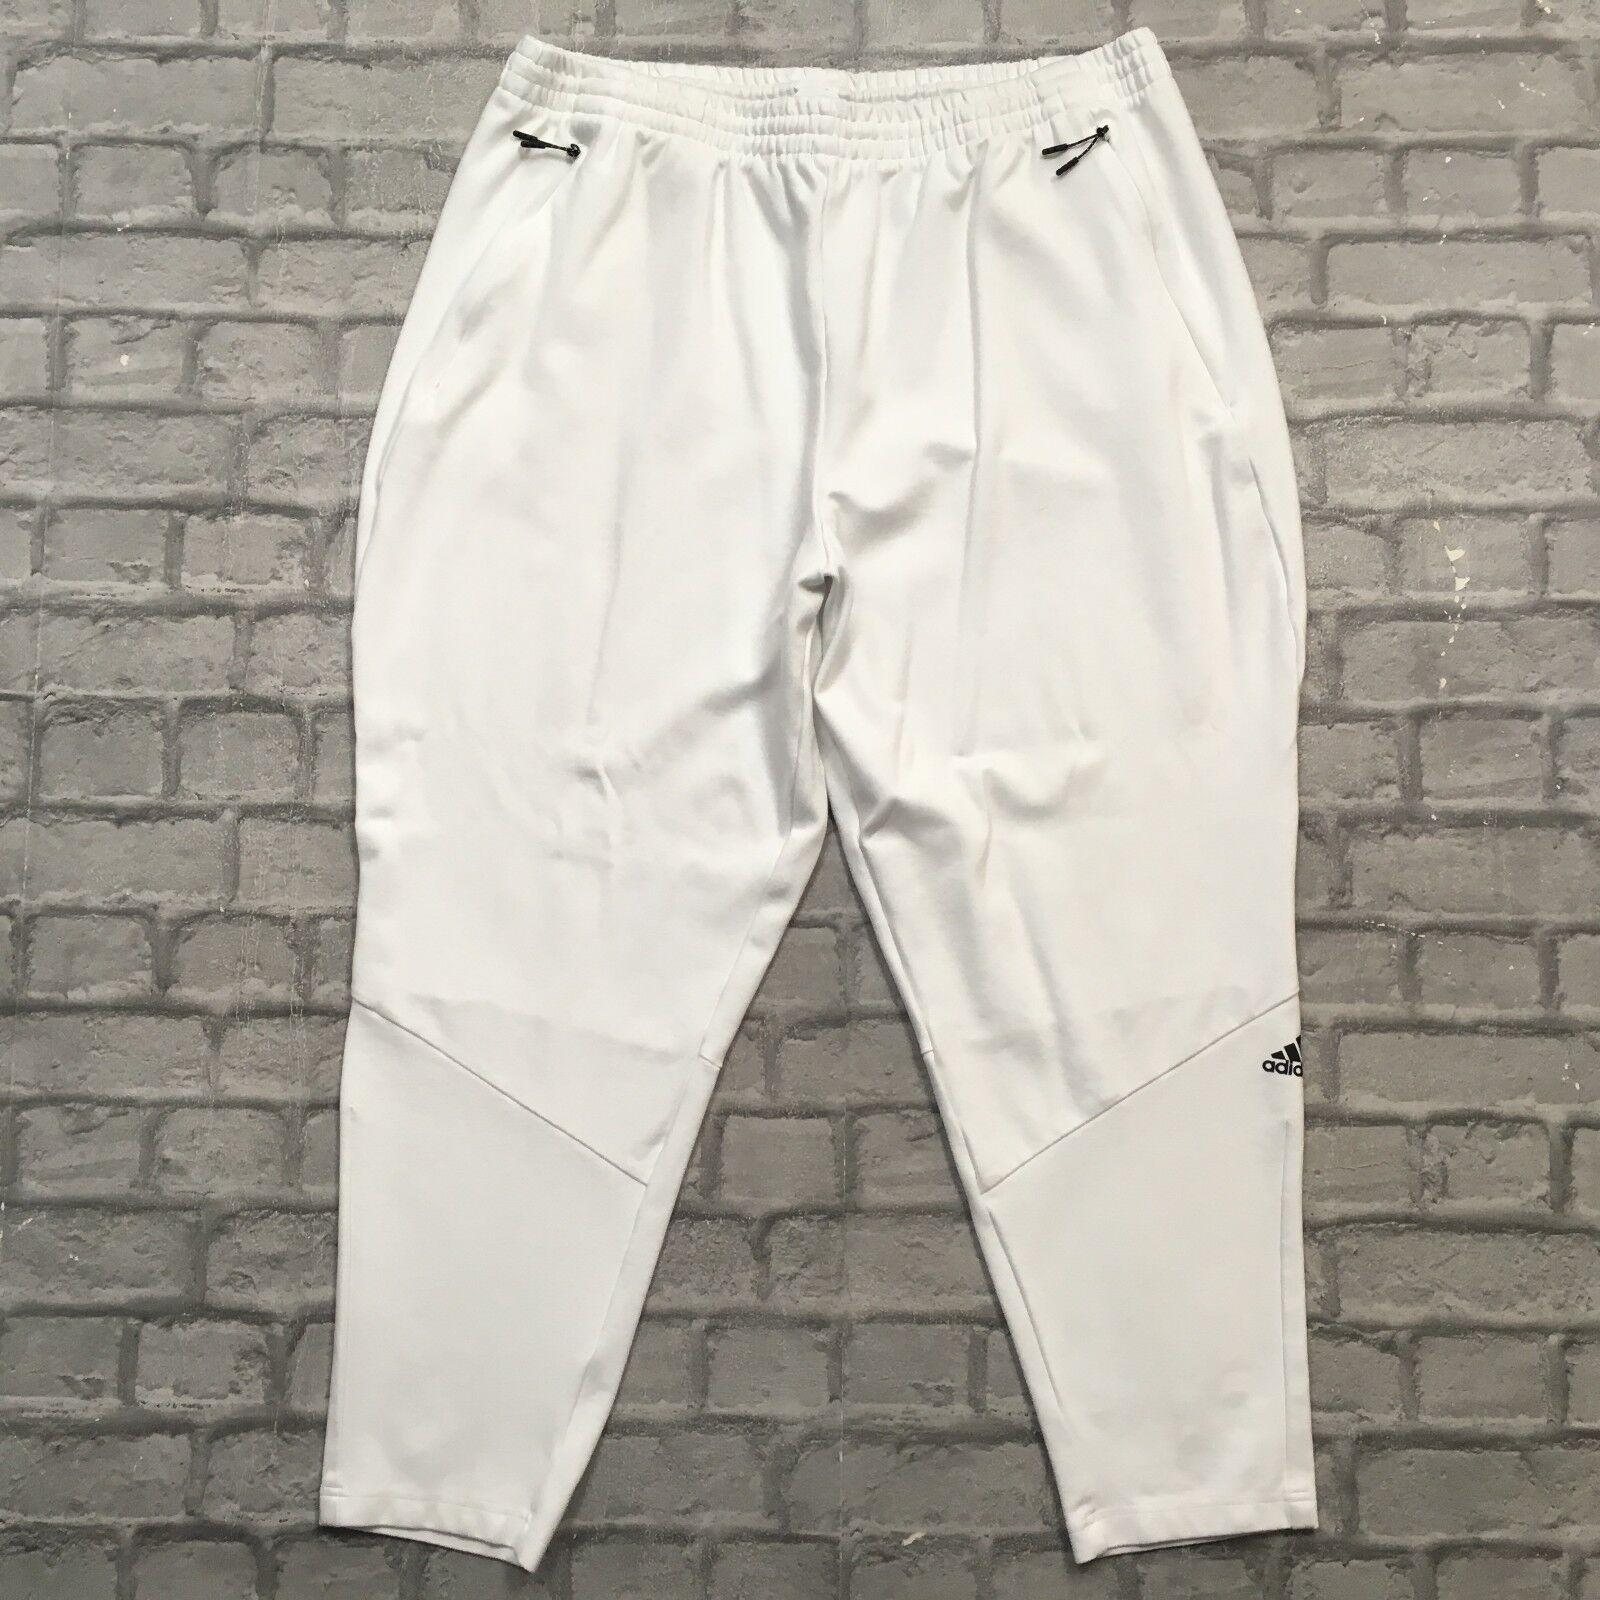 Blanc Uk Performance Adidas De Zne 2xl Jogging Homme Pantalon tPwnqaZ